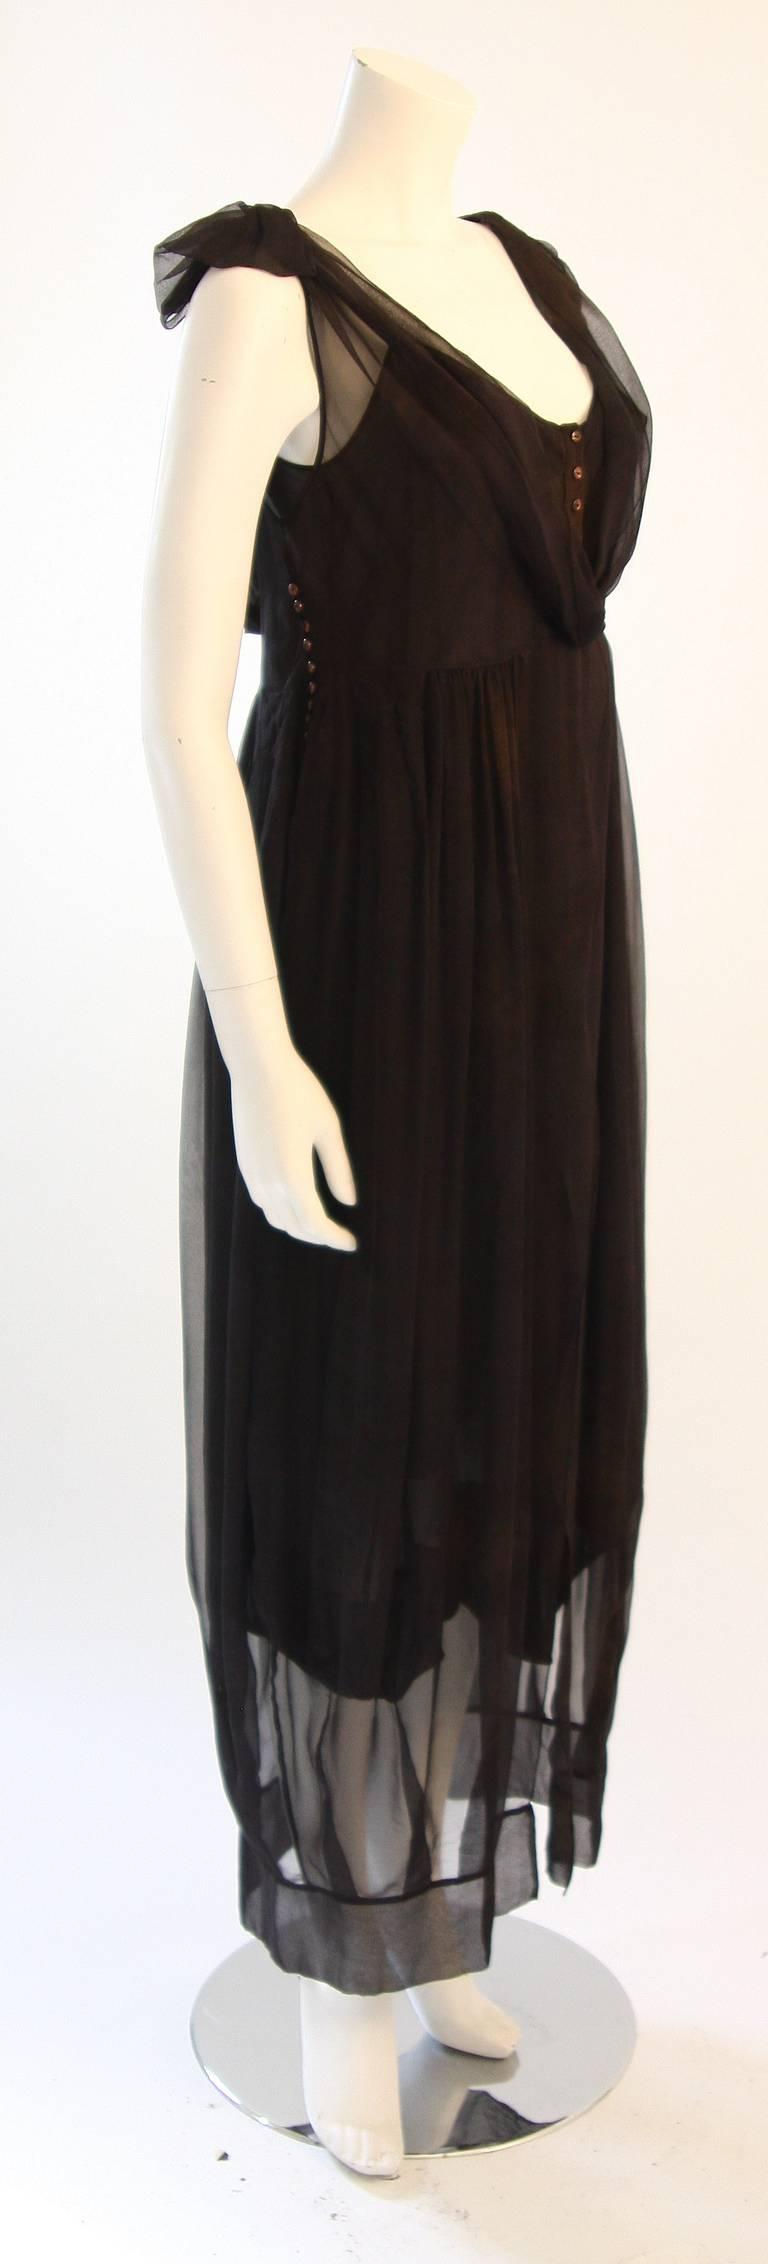 Women's Chic Zac Posen Steam Punk Inspired Layered Black & Nude Silk Dress Ensemble For Sale